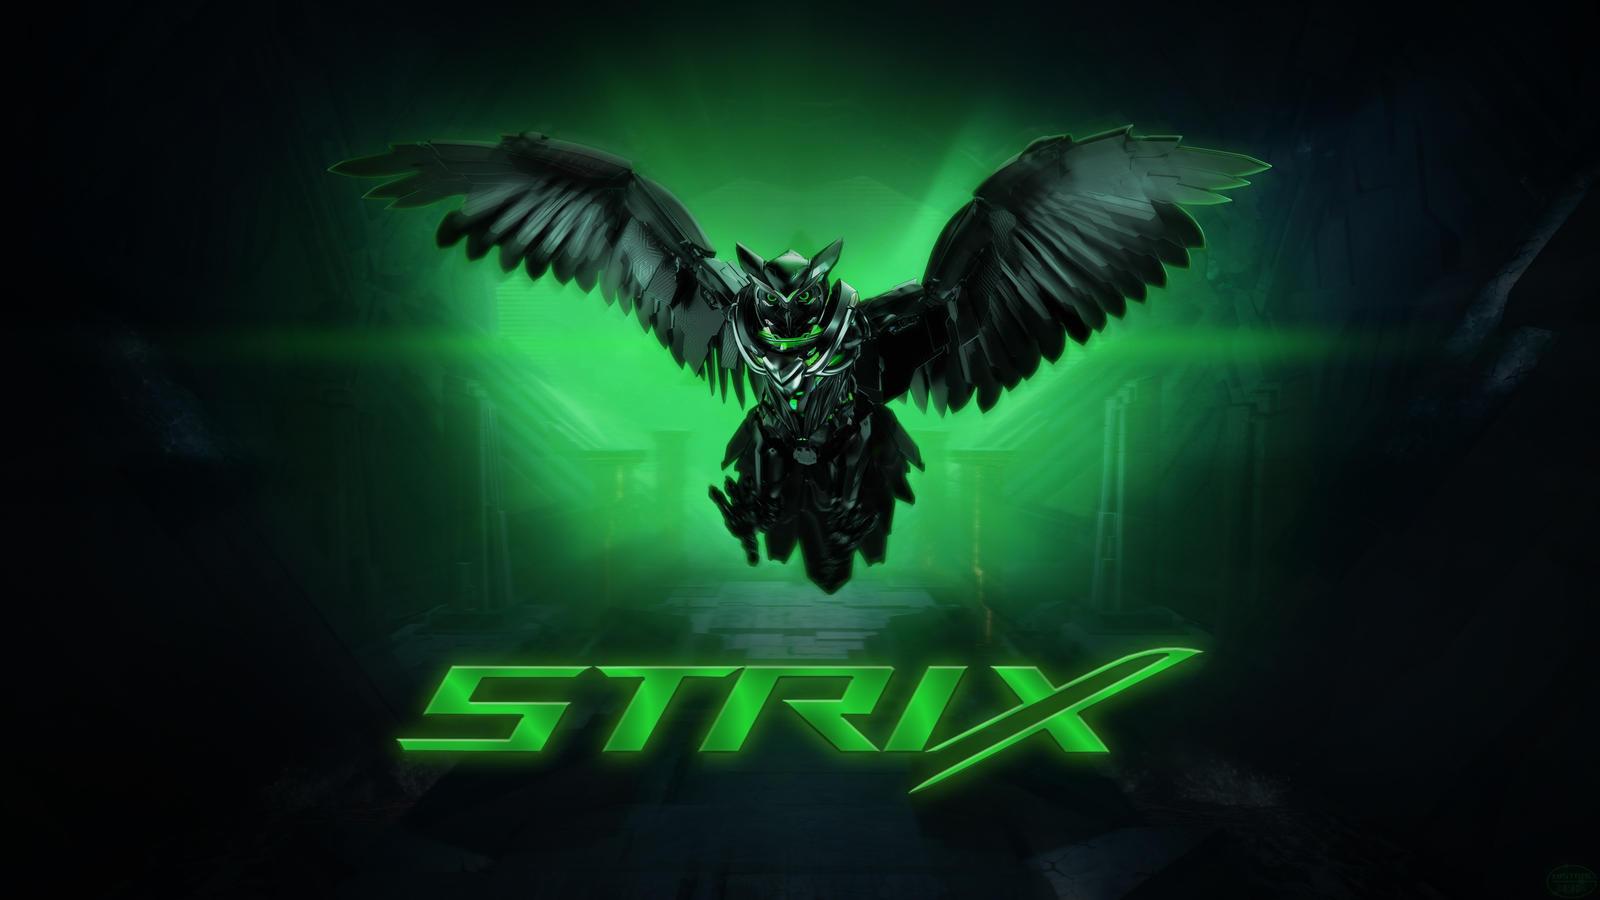 Asus Rog Strix Wallpaper 4k Alien Green By Mstrl On Deviantart